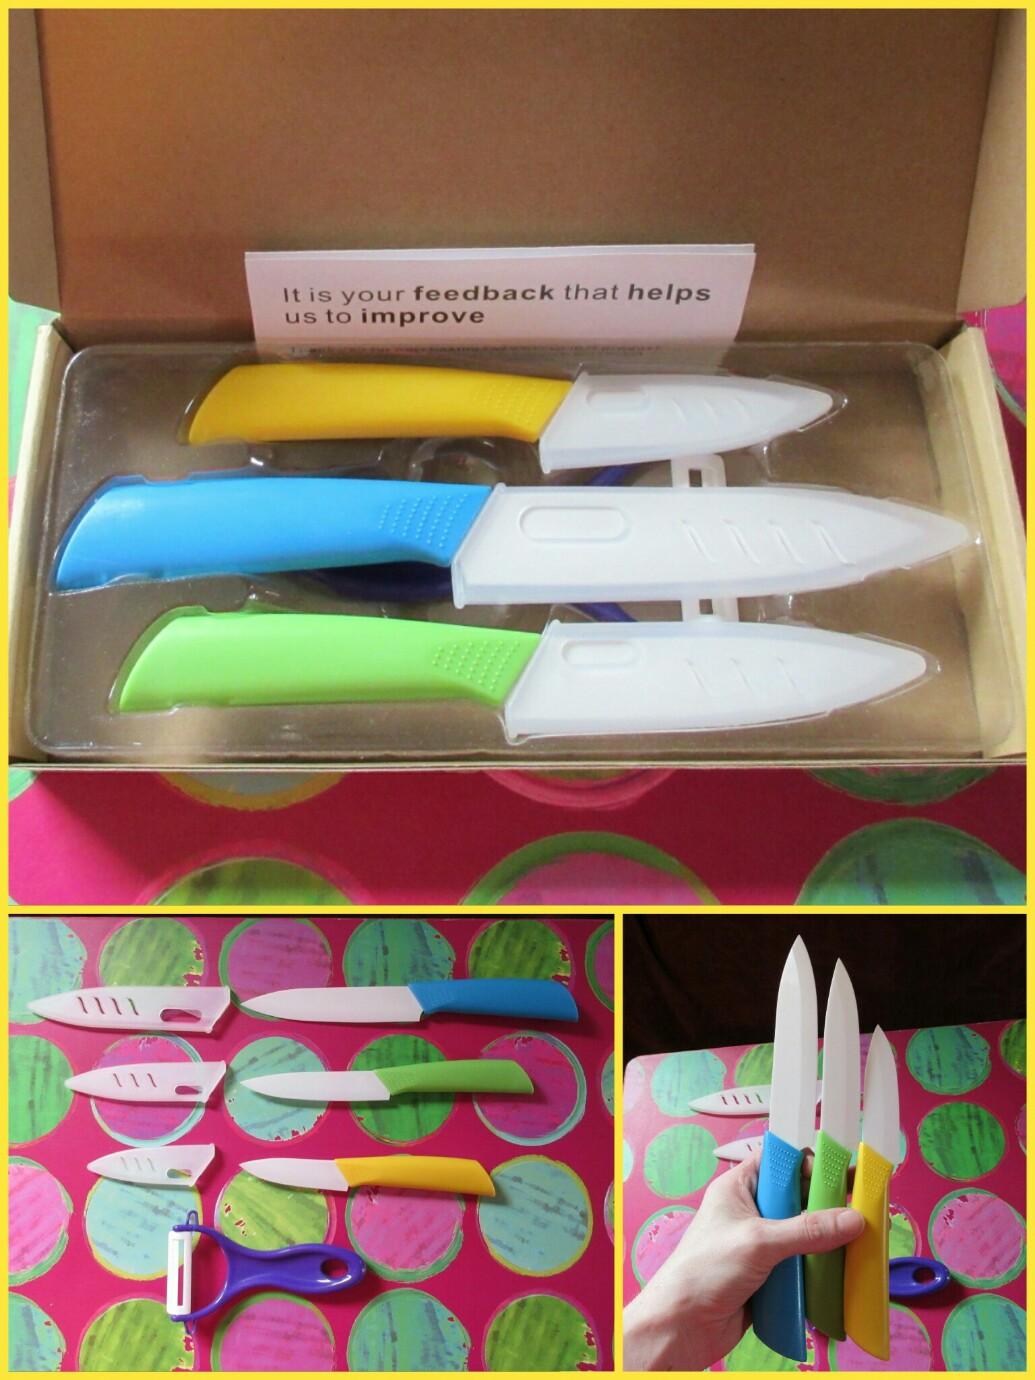 Very nice knives